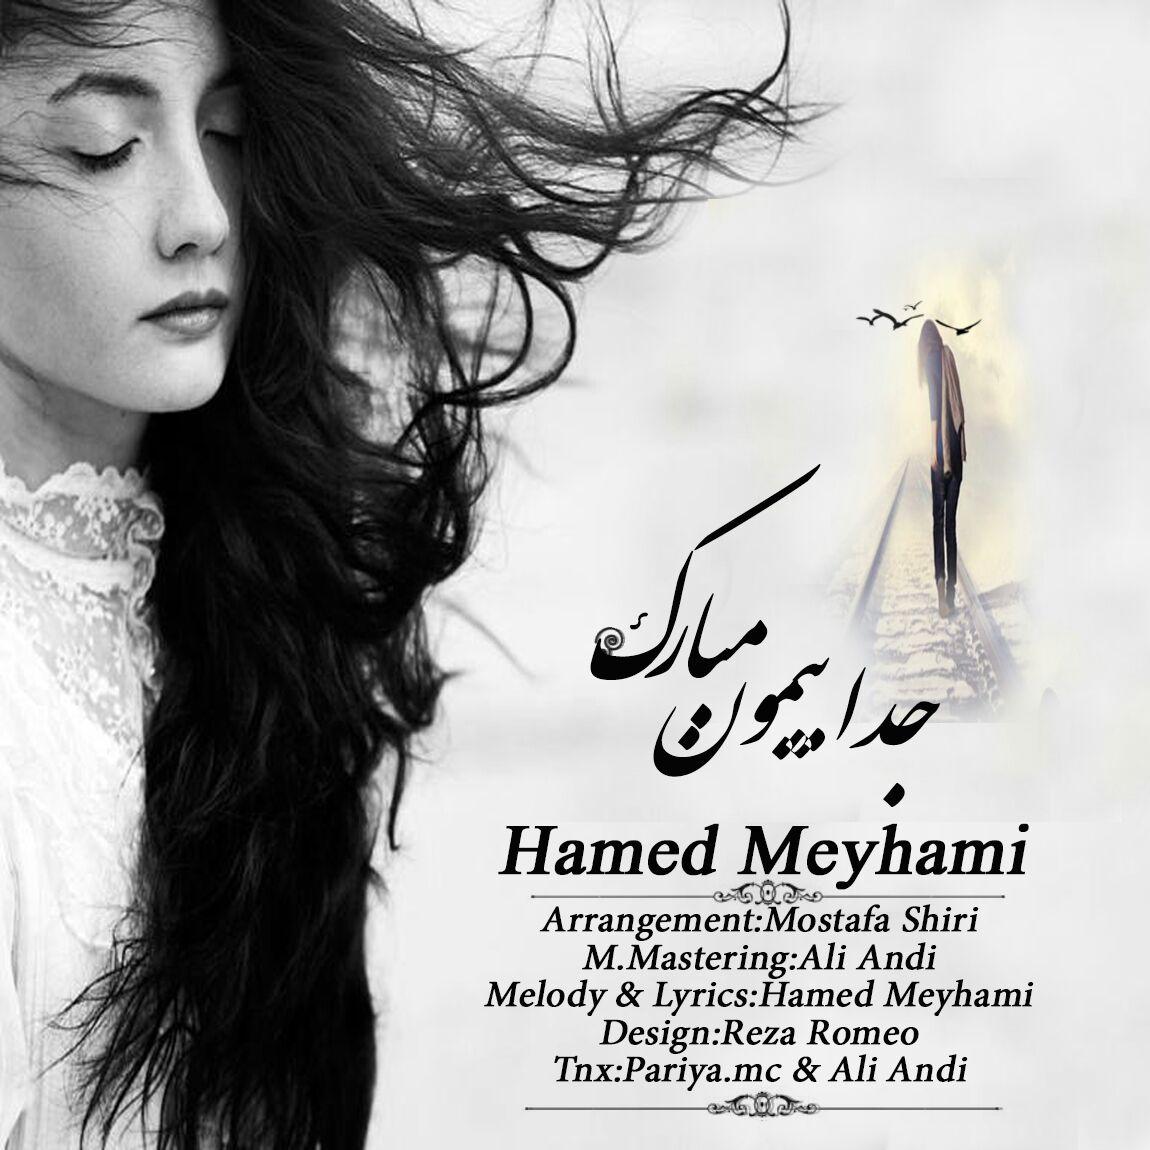 Hamed meyhami حامد میهامی دانلود آهنگ جدید حامد میهمی جداییمون مبارک